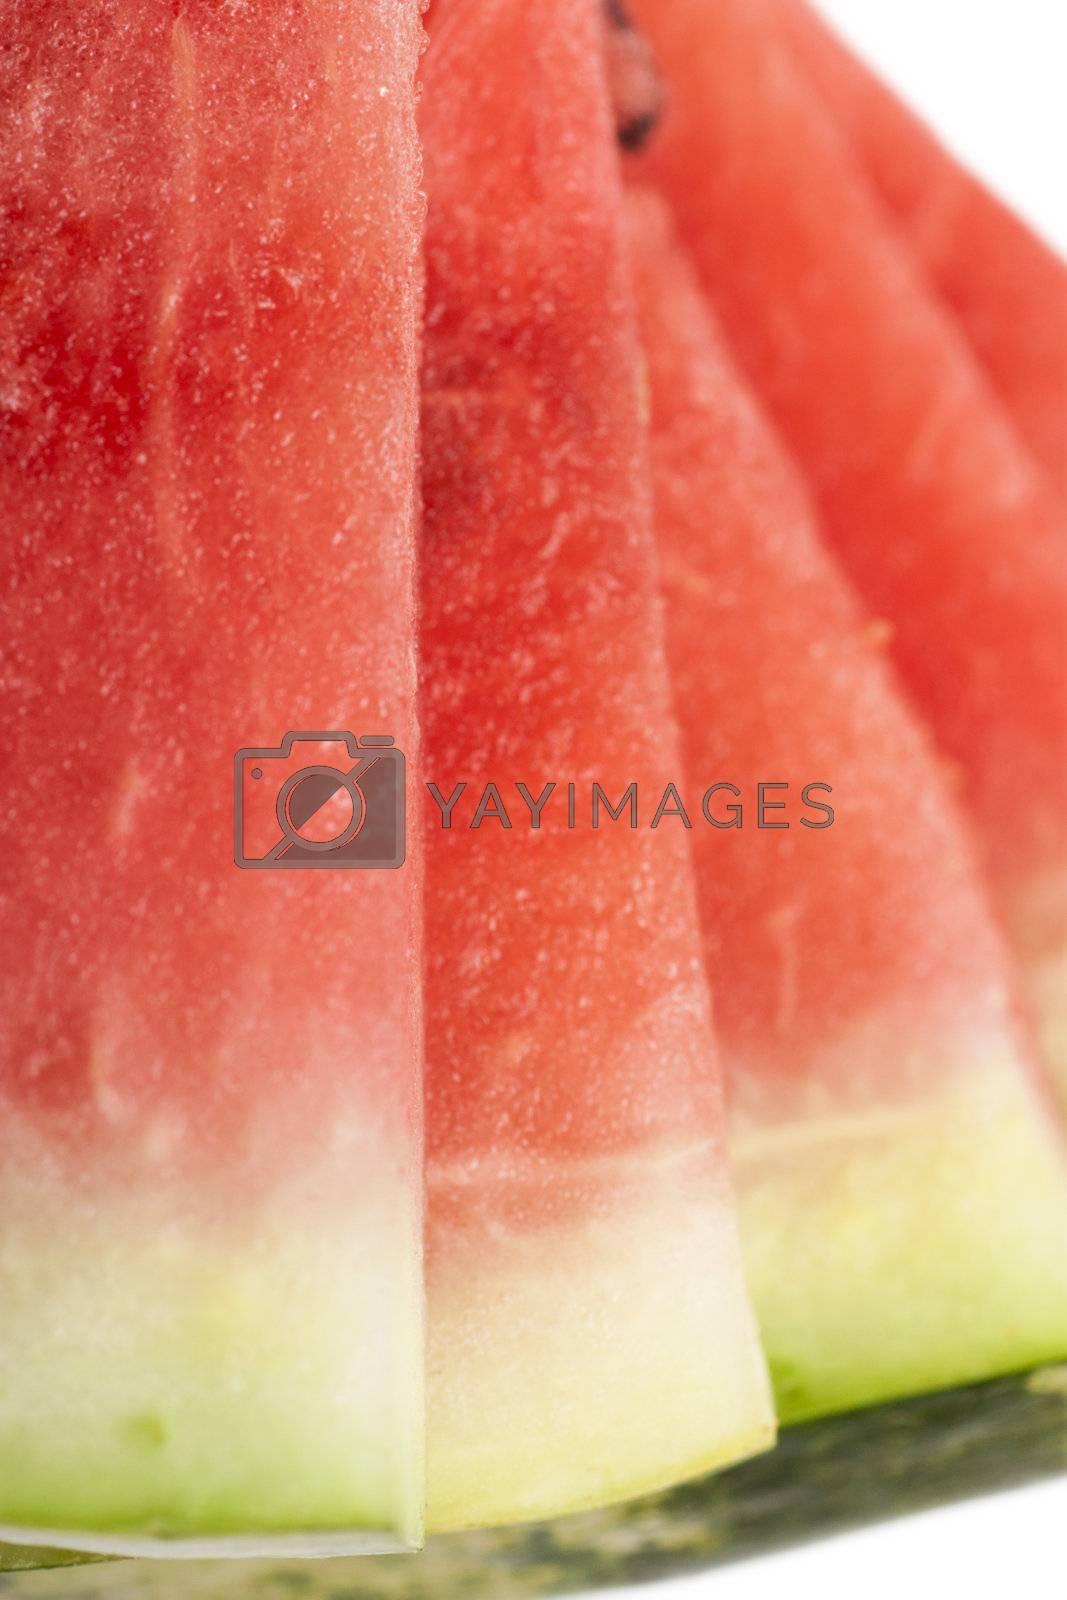 Macro view of fresh watermelon slices